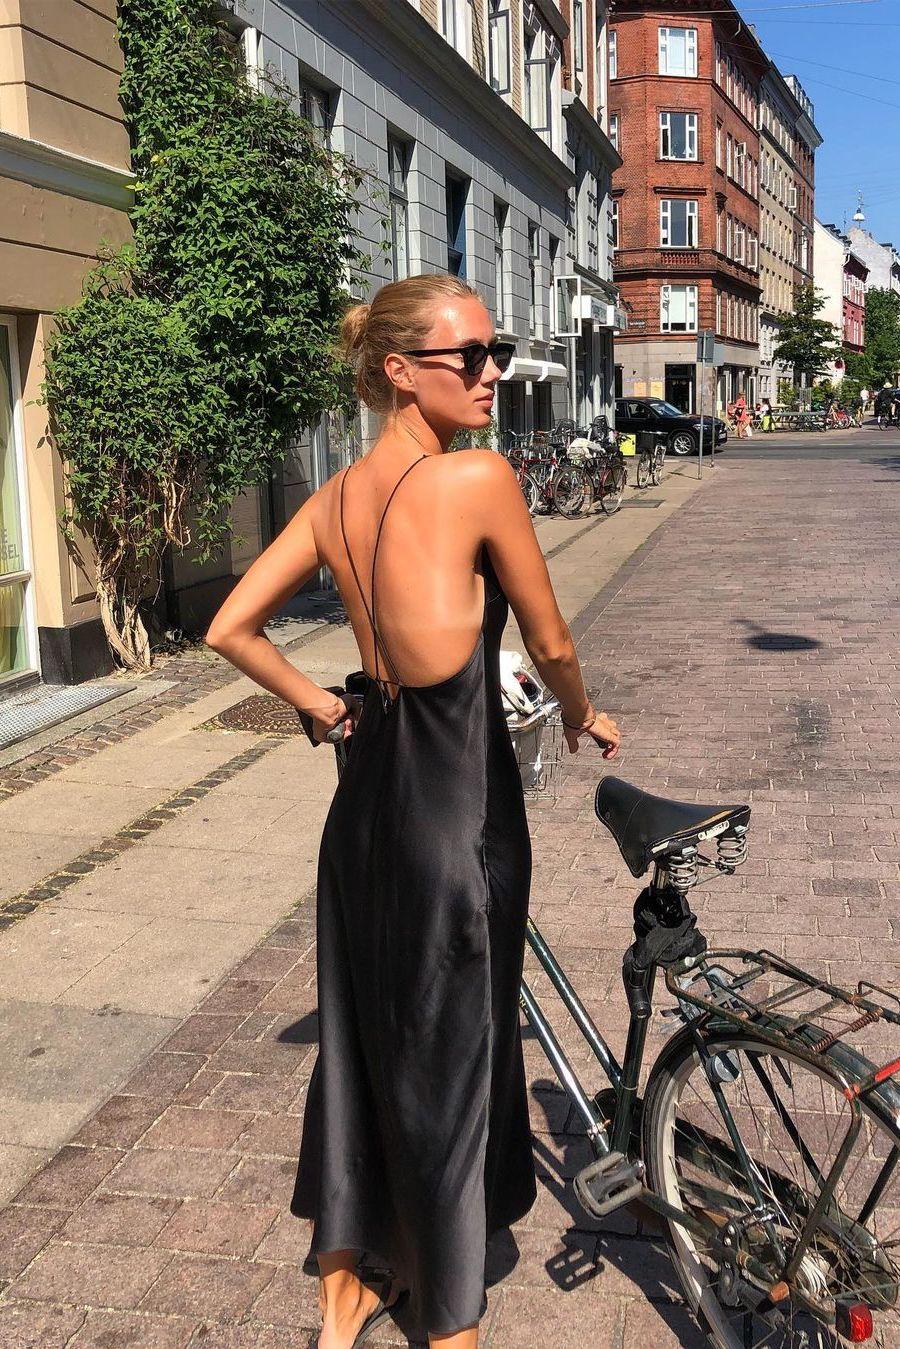 Summer capsule basic: A simple slip dress